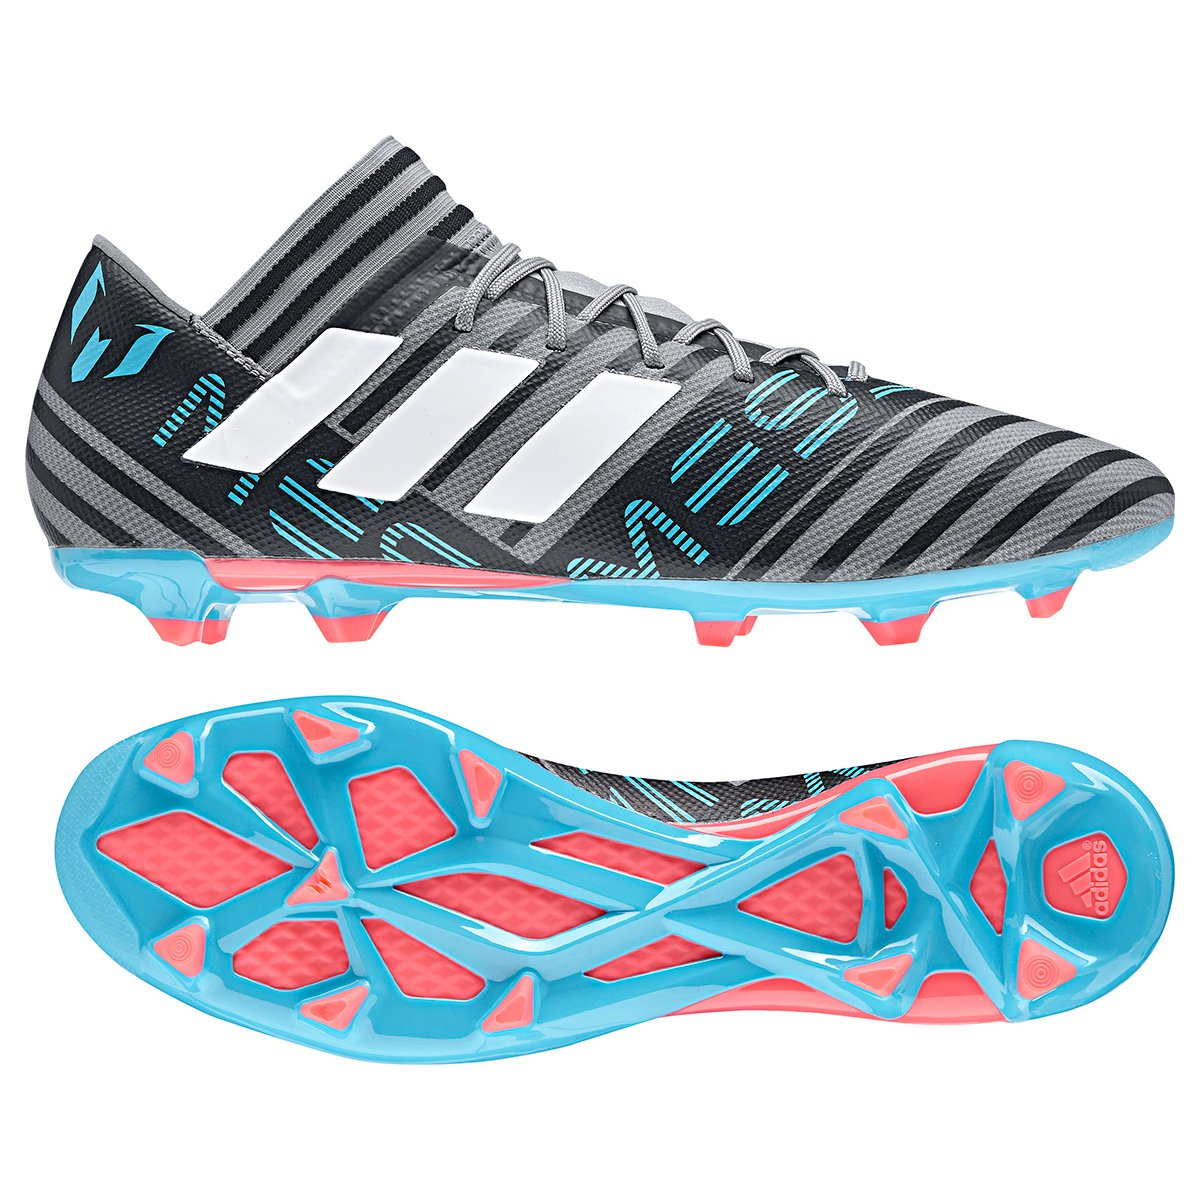 cfc56c46a5 Chuteira Campo Adidas Nemeziz Messi 17.3 FXG